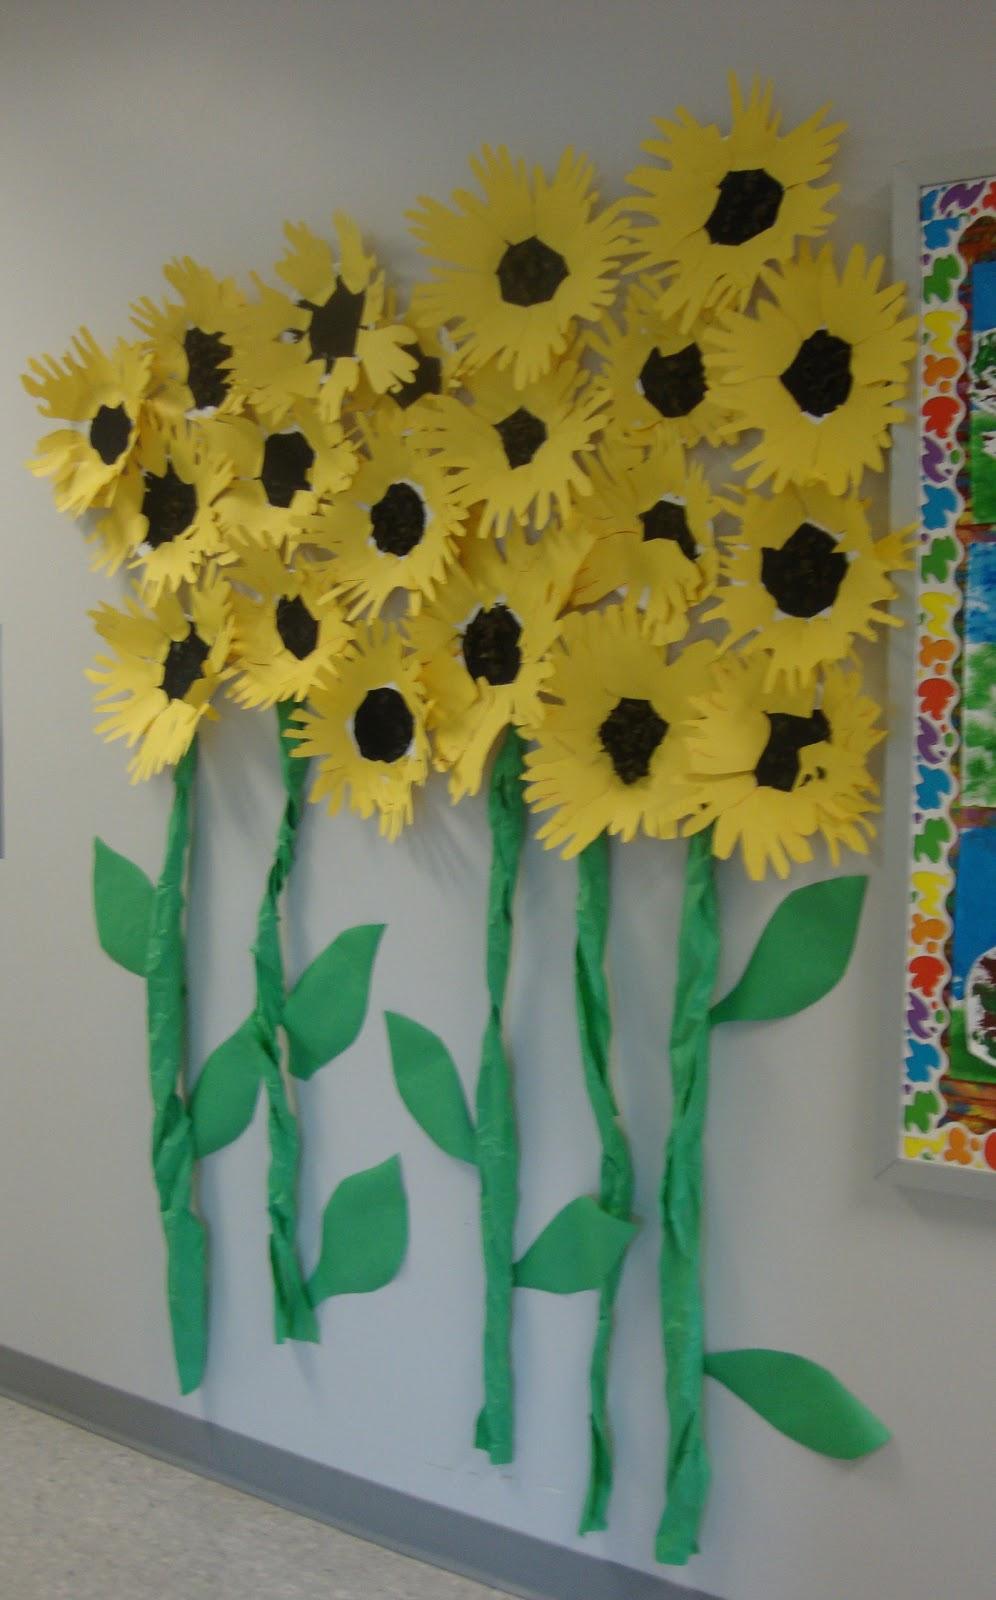 Paper Plates (one for each child) - Black Tempera Paint - Paintbrushes - Brown Tissue Paper - Yellow Construction Paper - Scissors & Art. Paper. Scissors. Glue!: Sunflowers and Sculptures